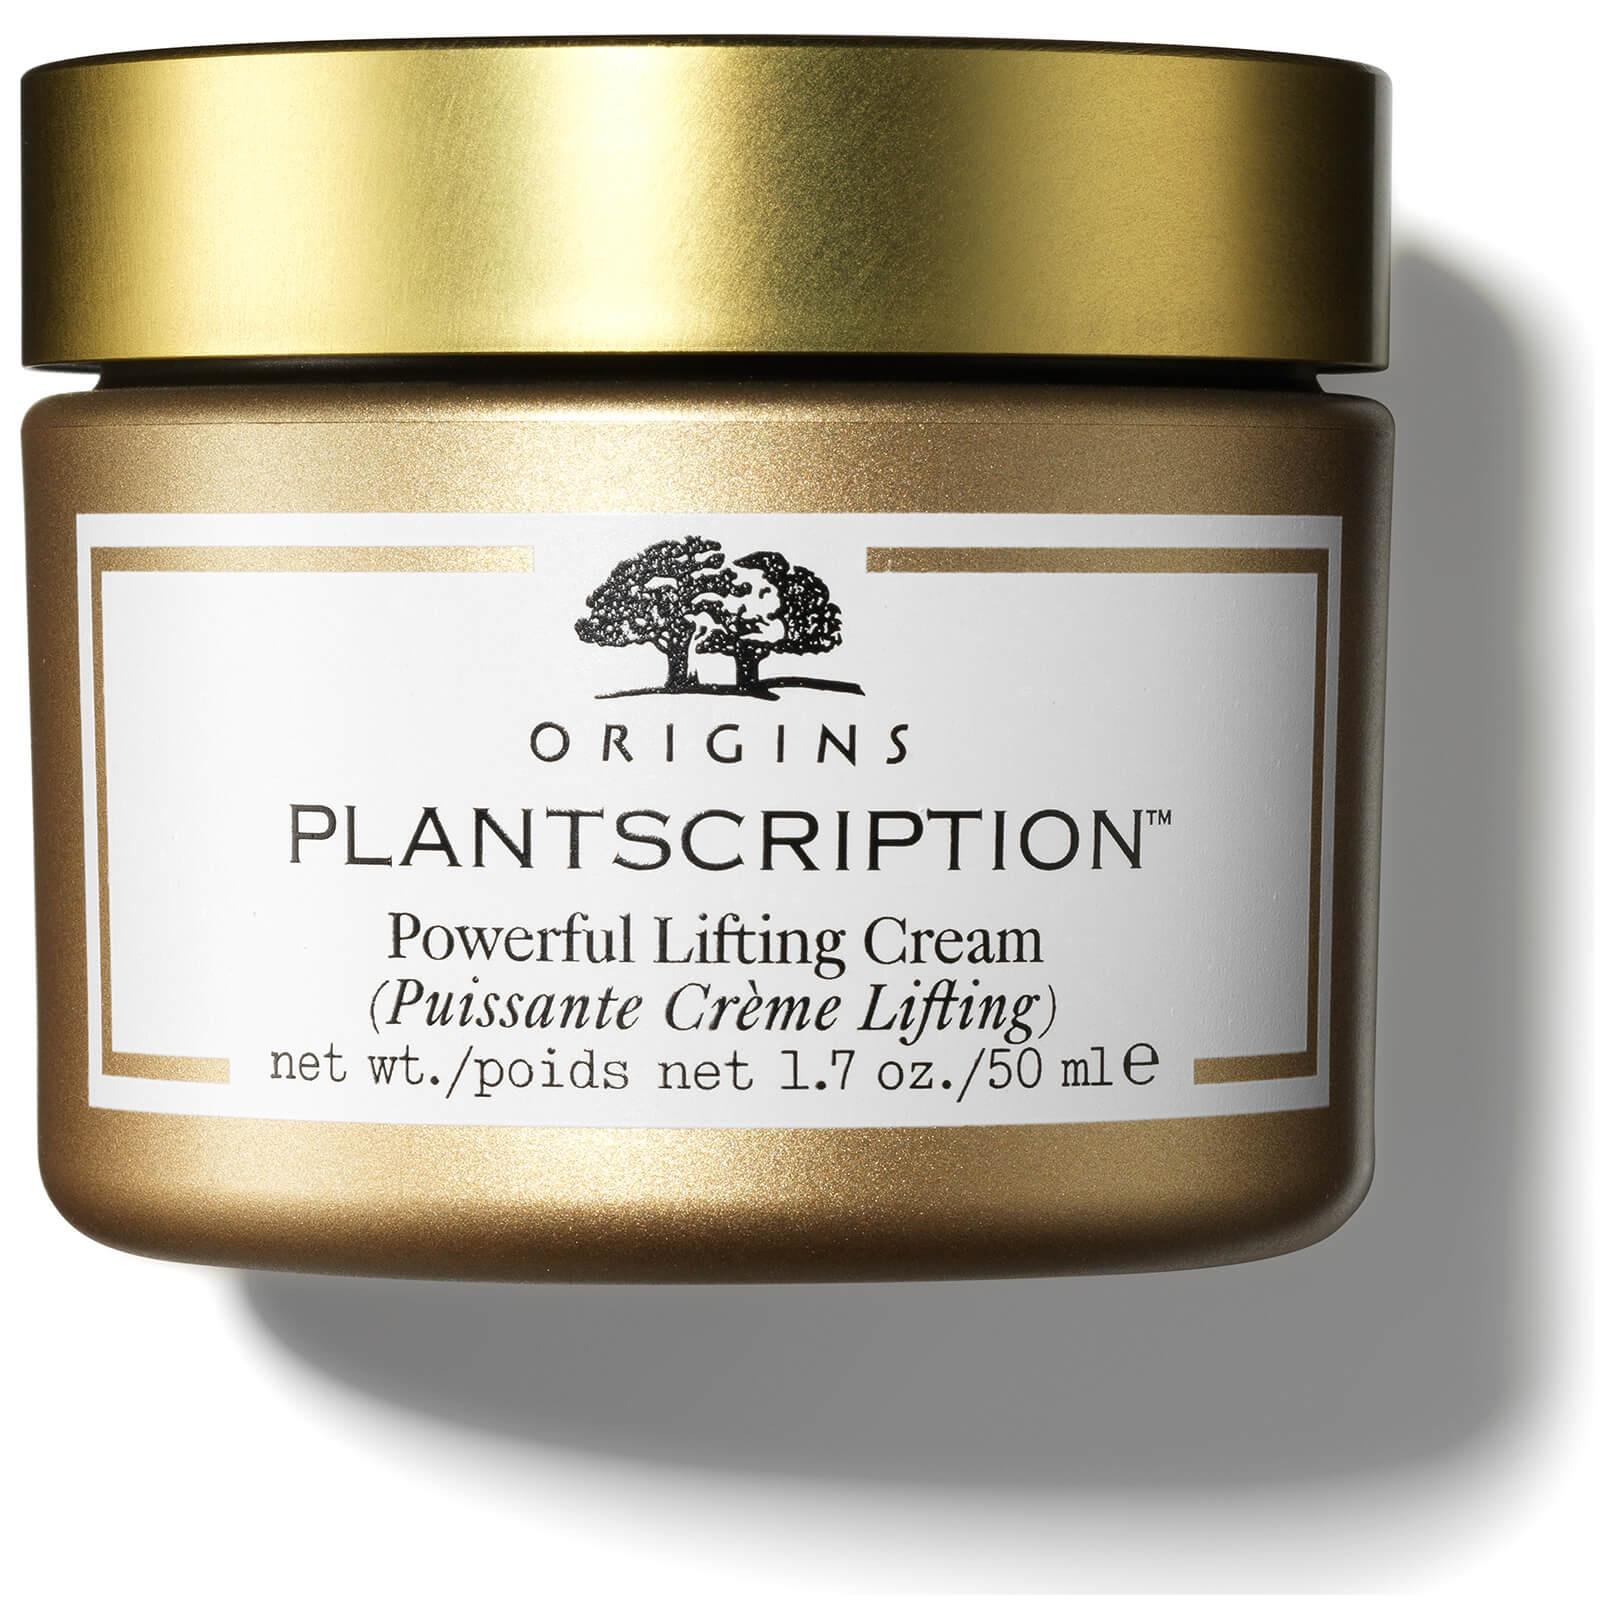 Origins Plantscription™ Powerful Lifting Cream